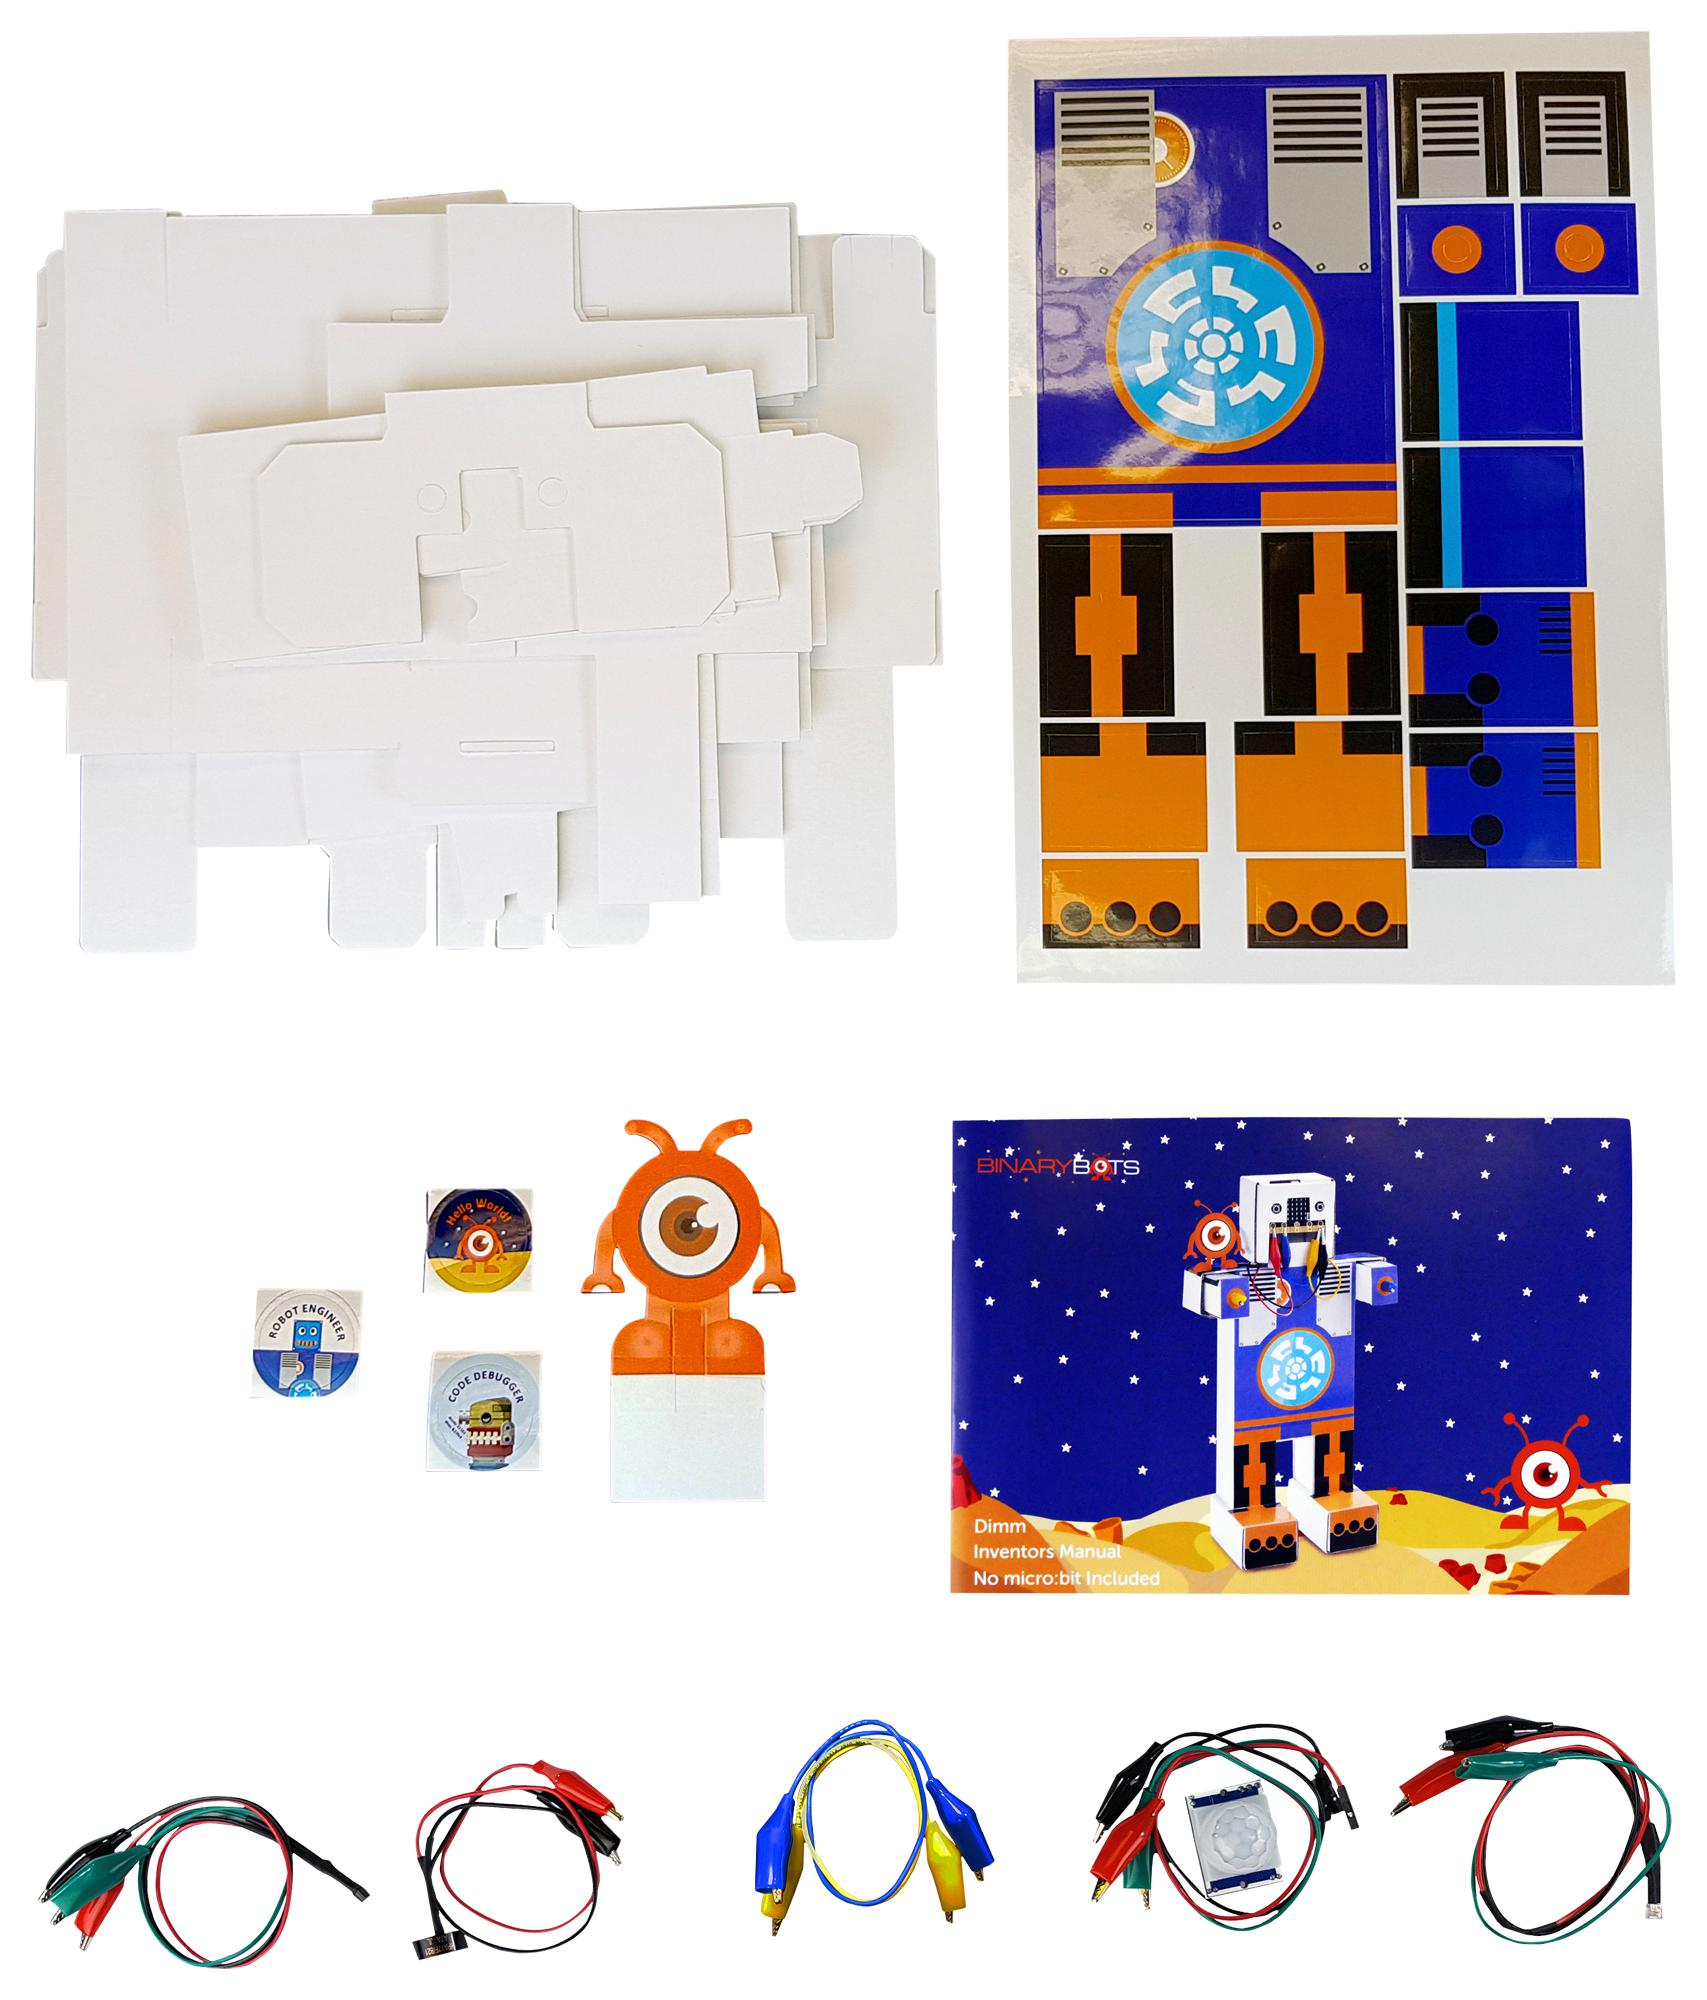 kit robot pentru micro:bit